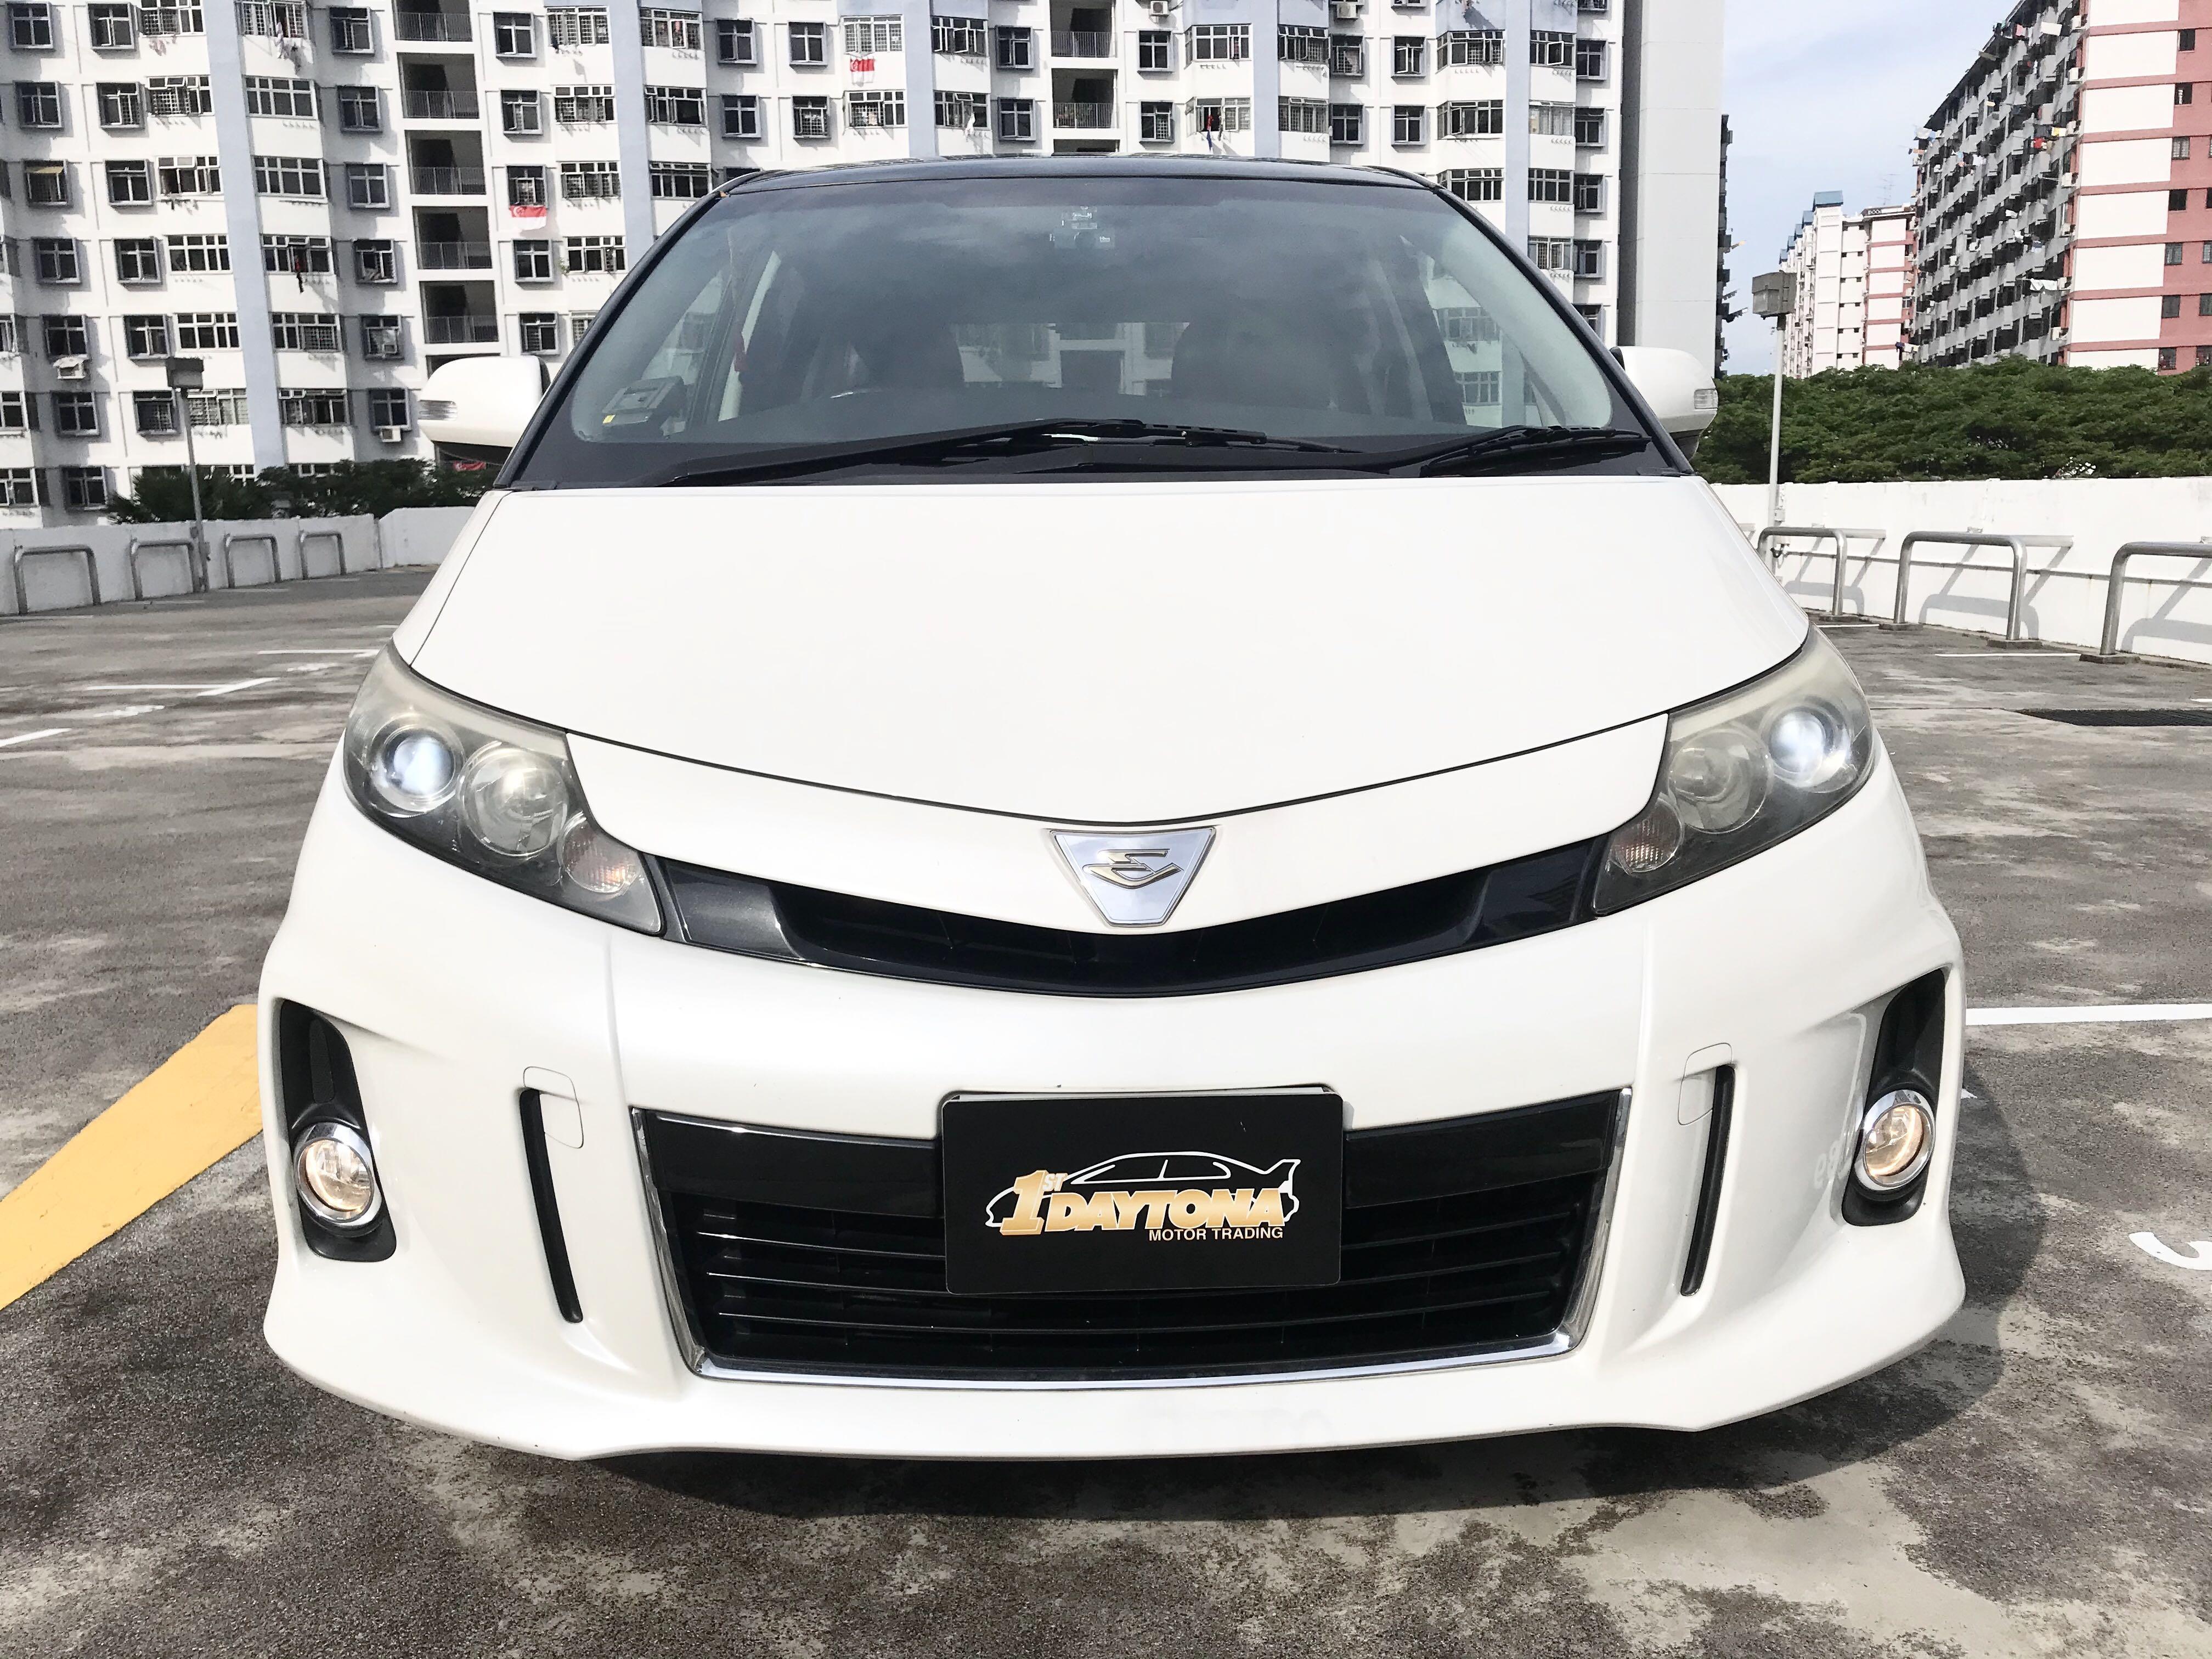 Toyota Estima 2.4A Aeras Moonroof 8-Seater  Auto